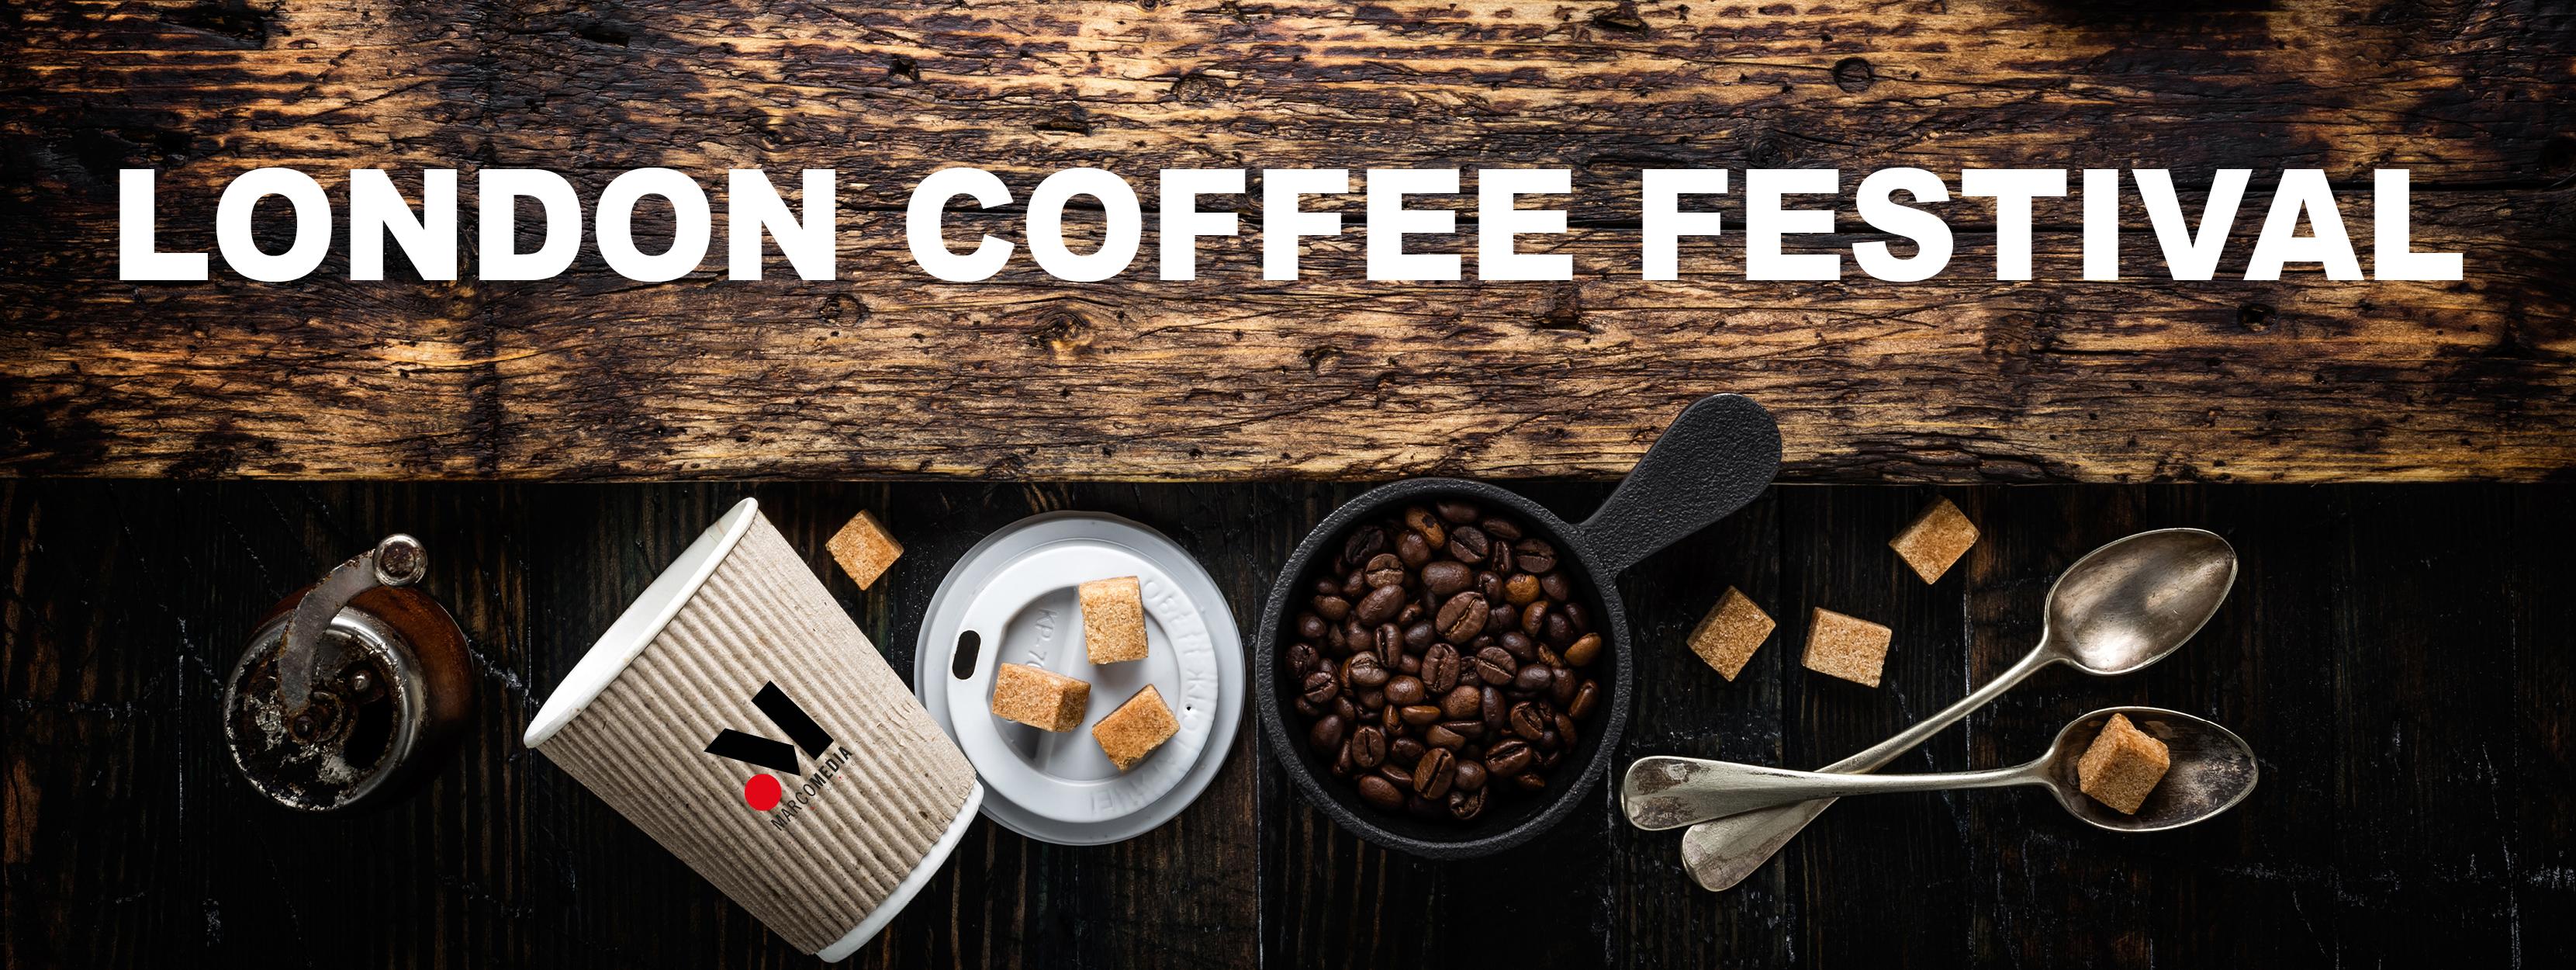 Inspiration: London Coffee Festival